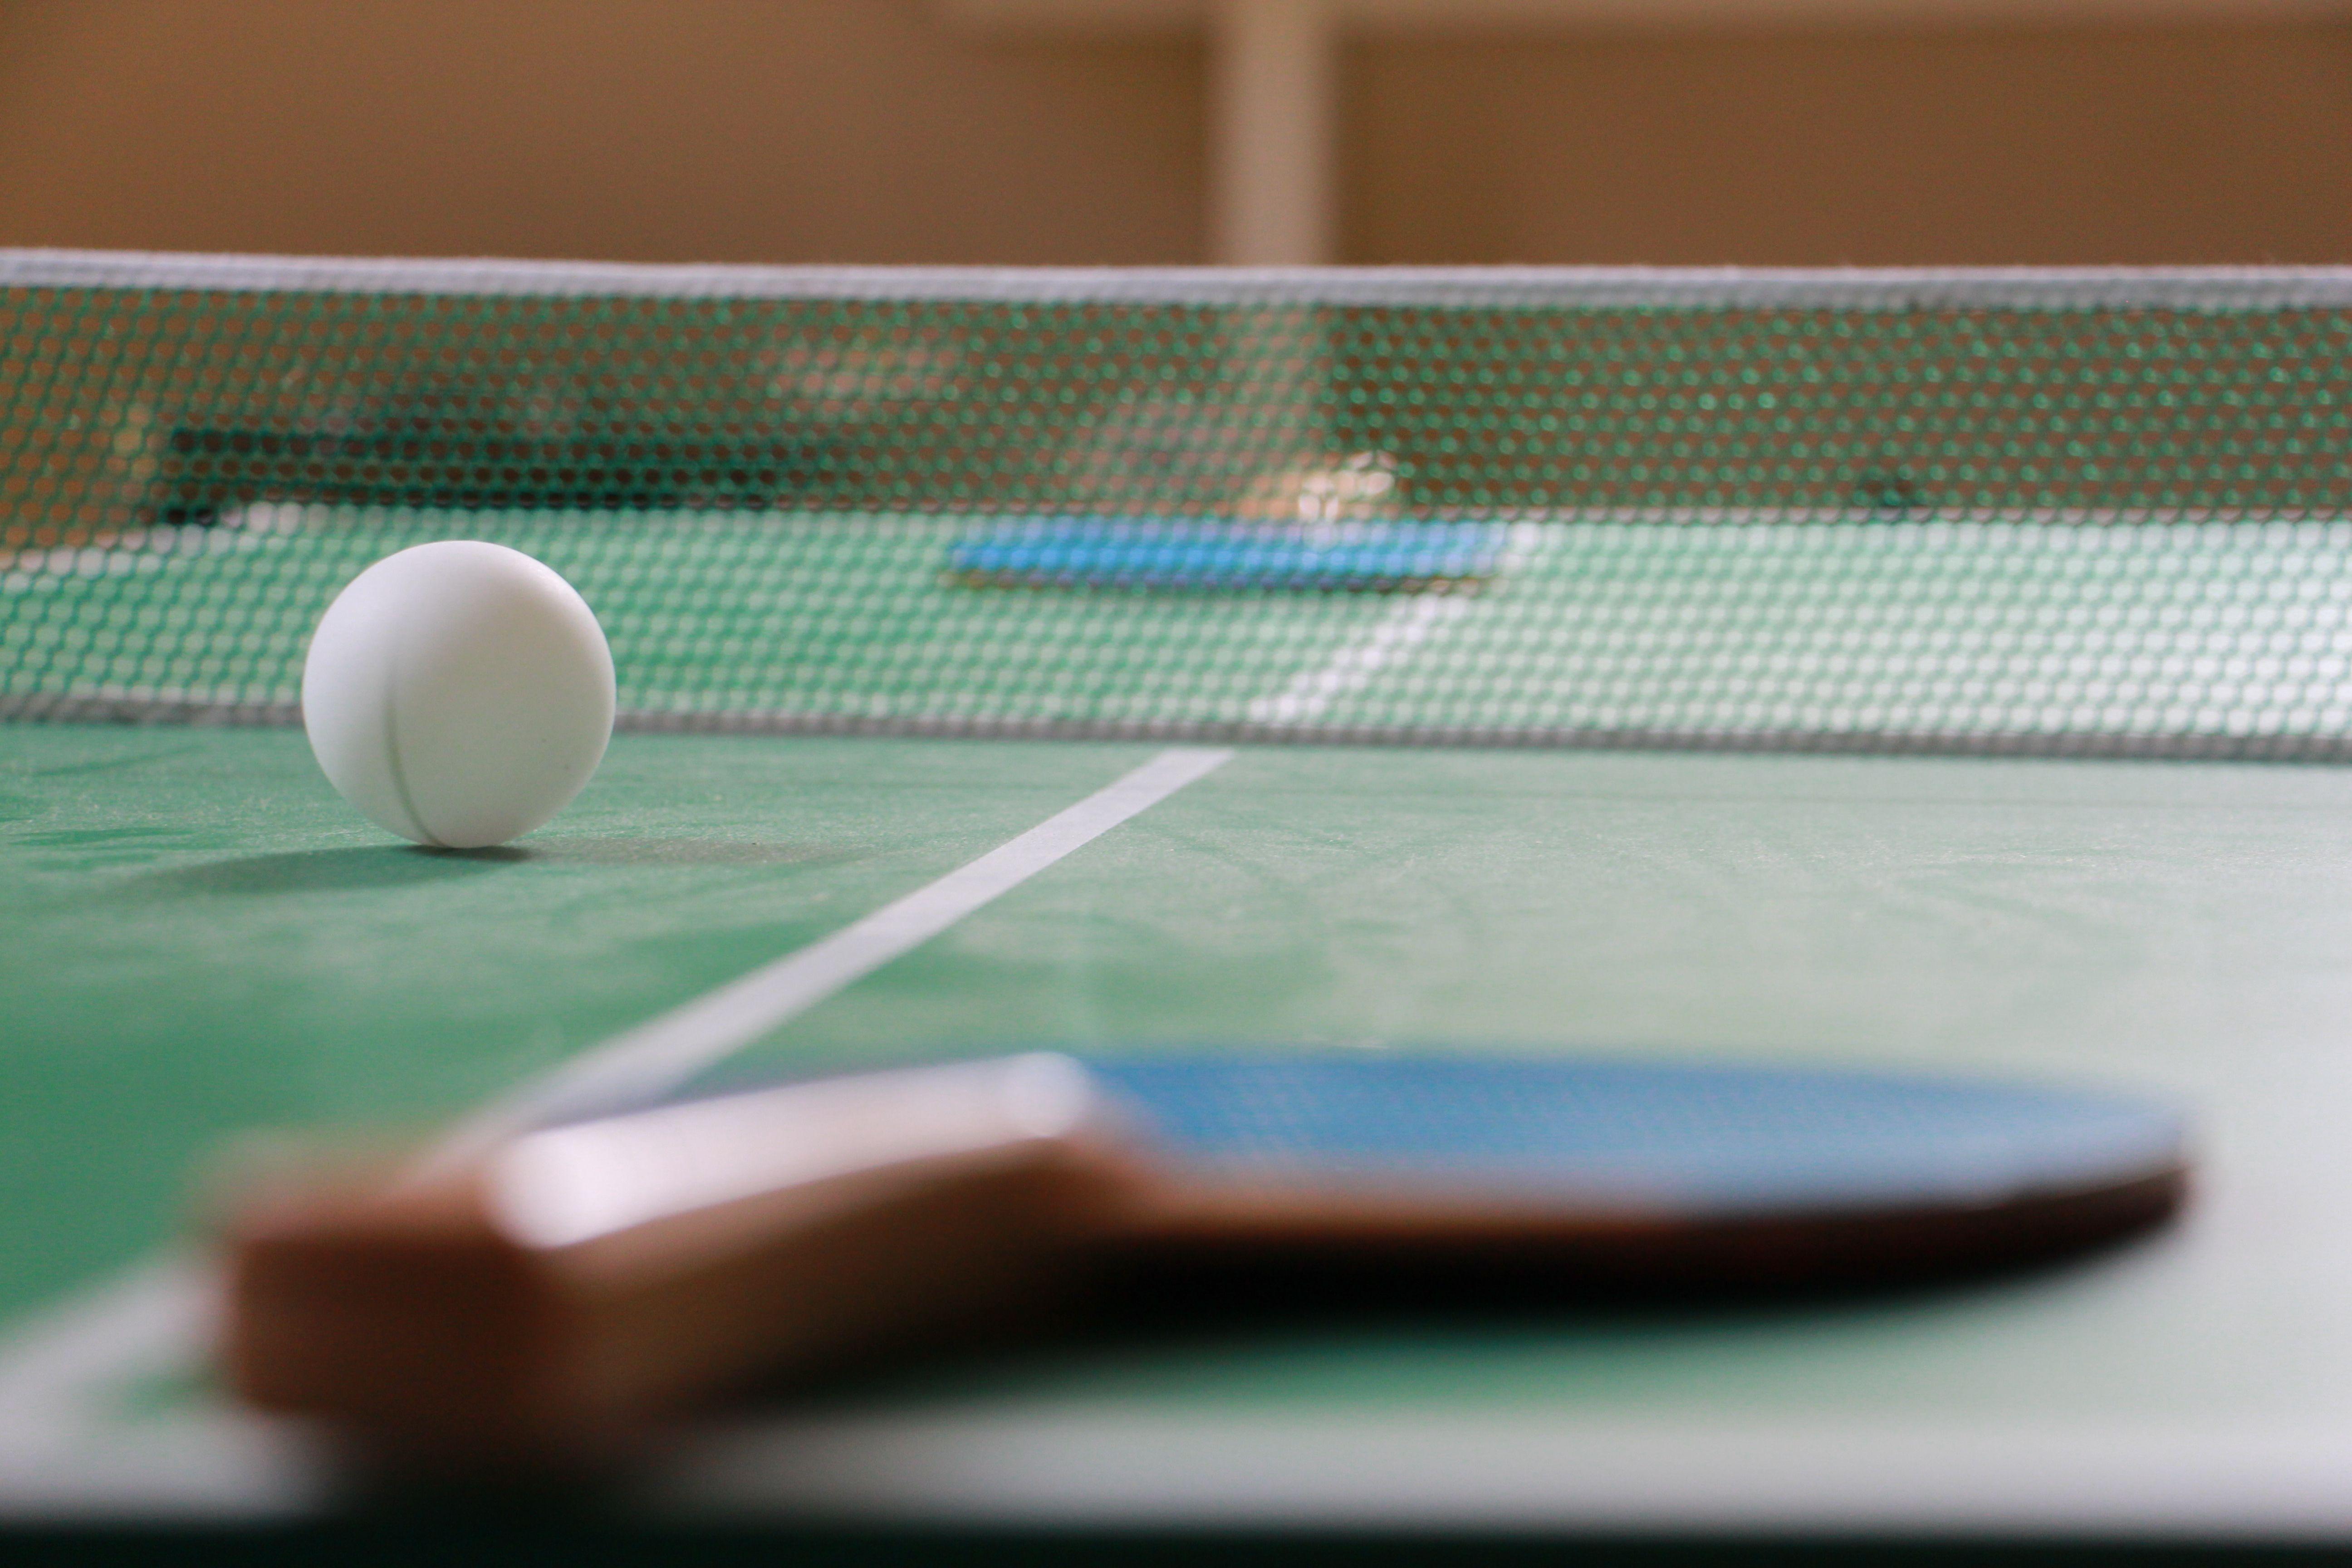 What is the skunk rule in table tennis buycottarizona